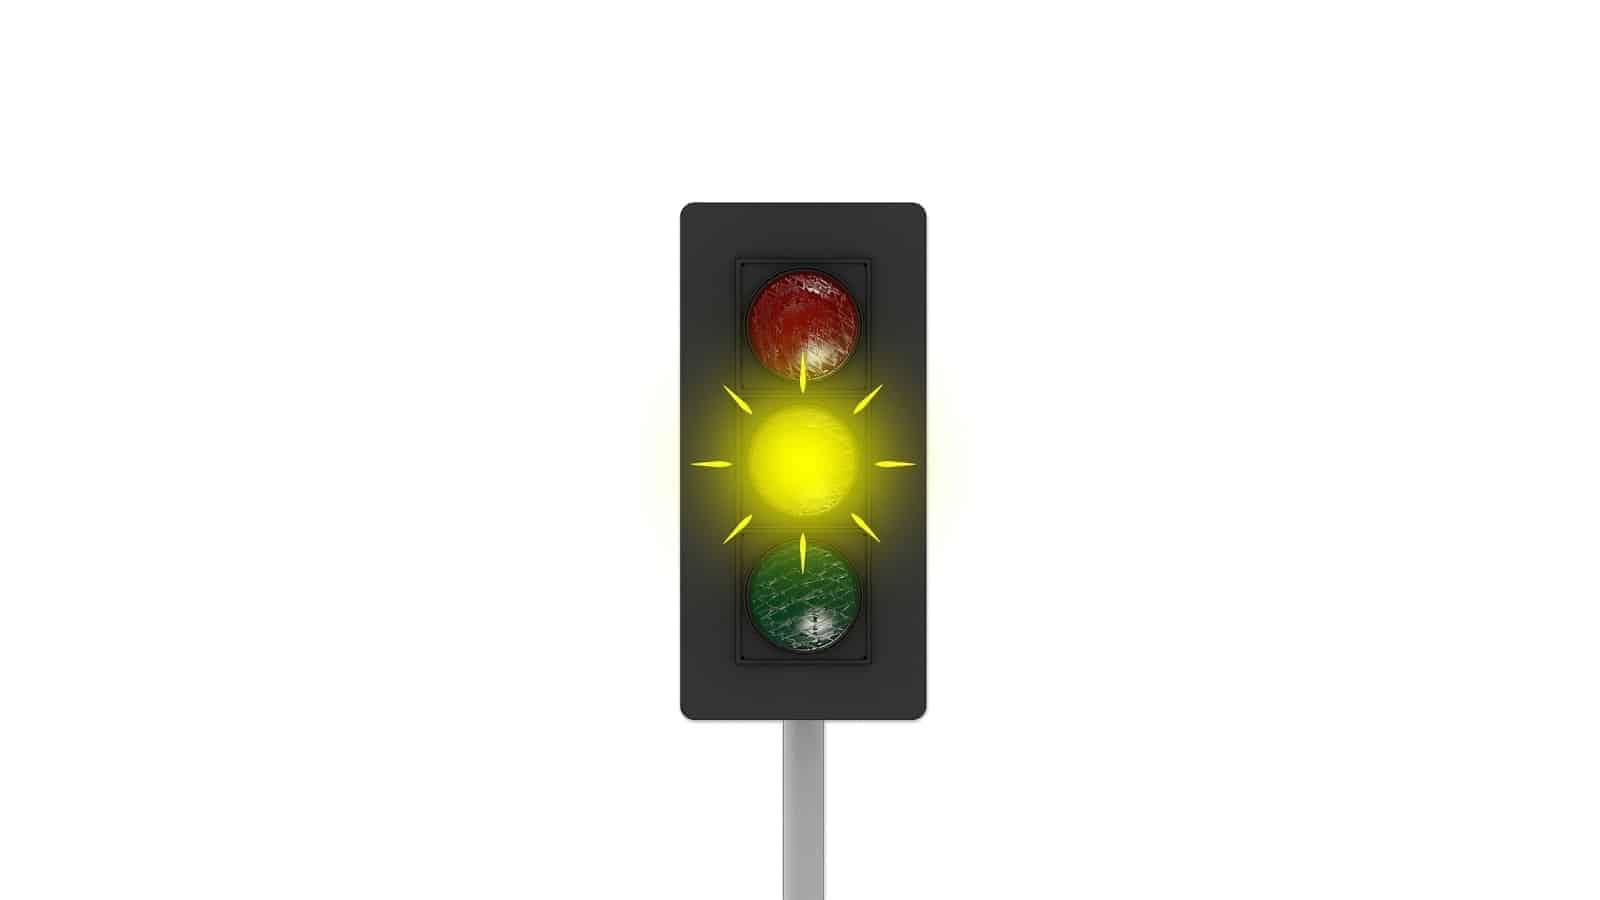 Yellow flashing traffic light